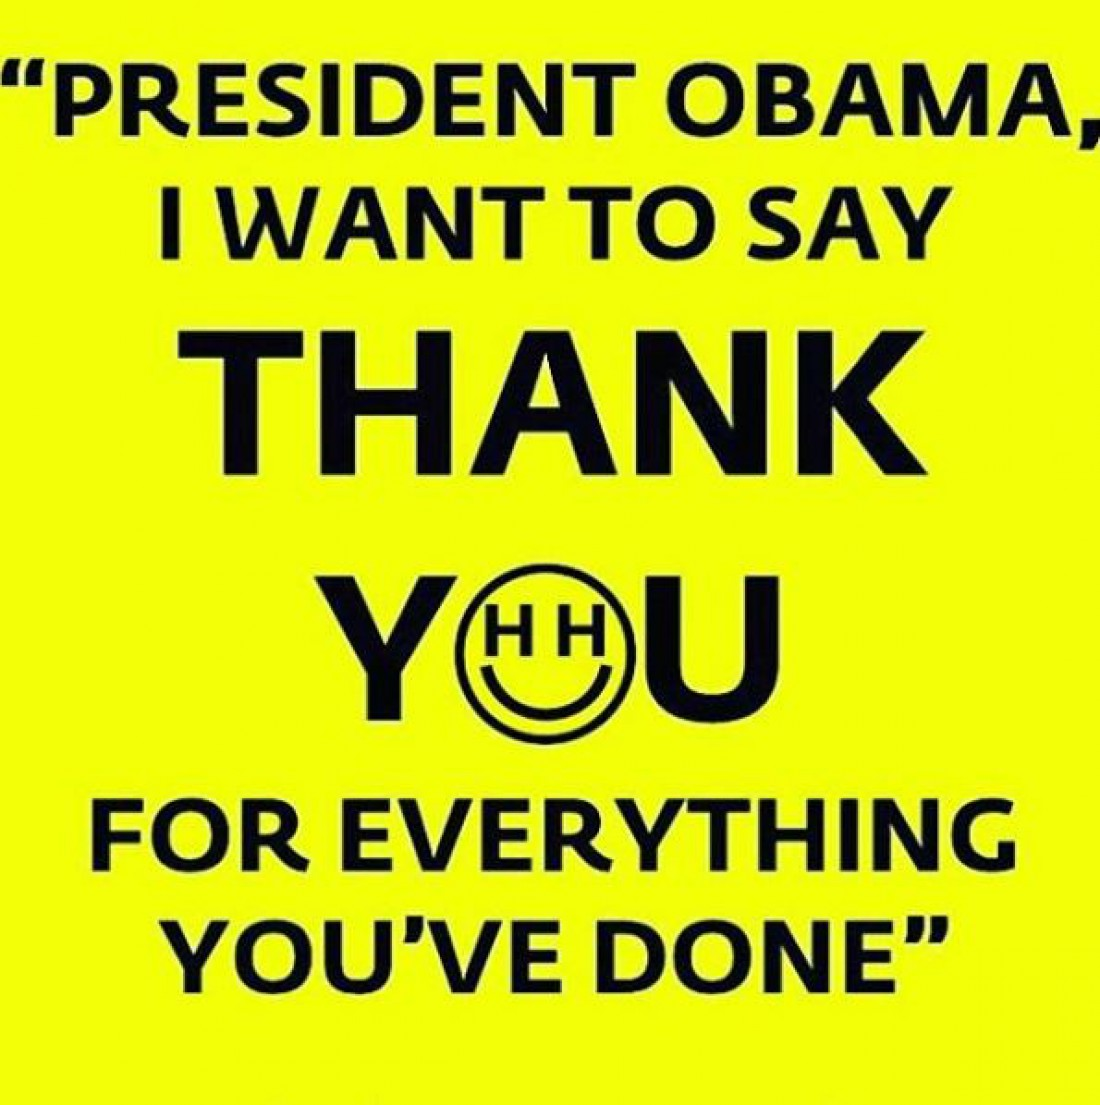 Майли Сайрус поблагодарила Барака Обаму за президентство